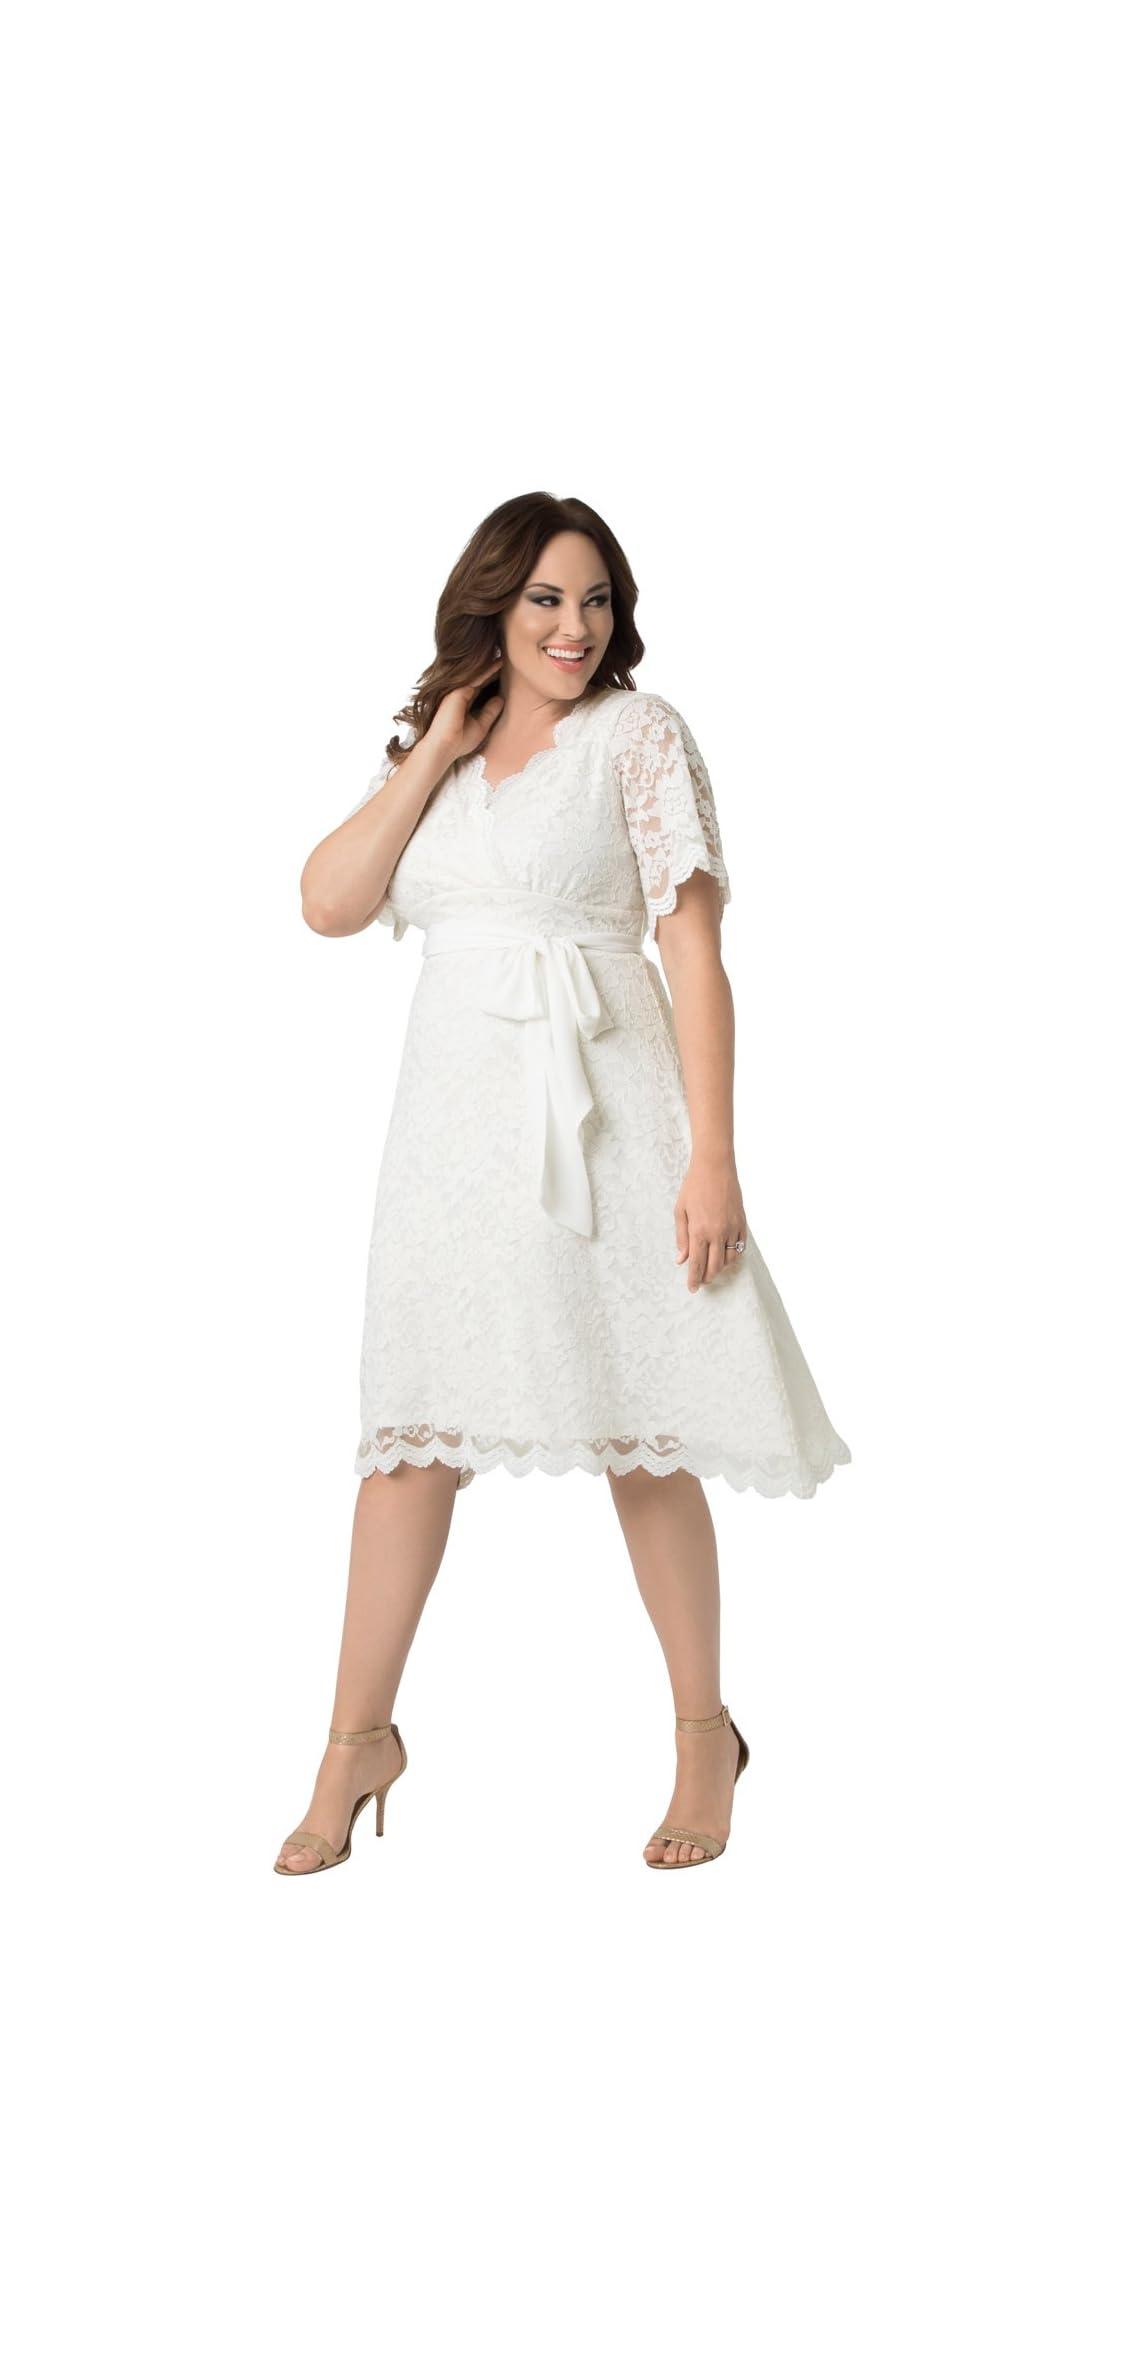 Women's Plus Size Graced With Love Wedding Dress